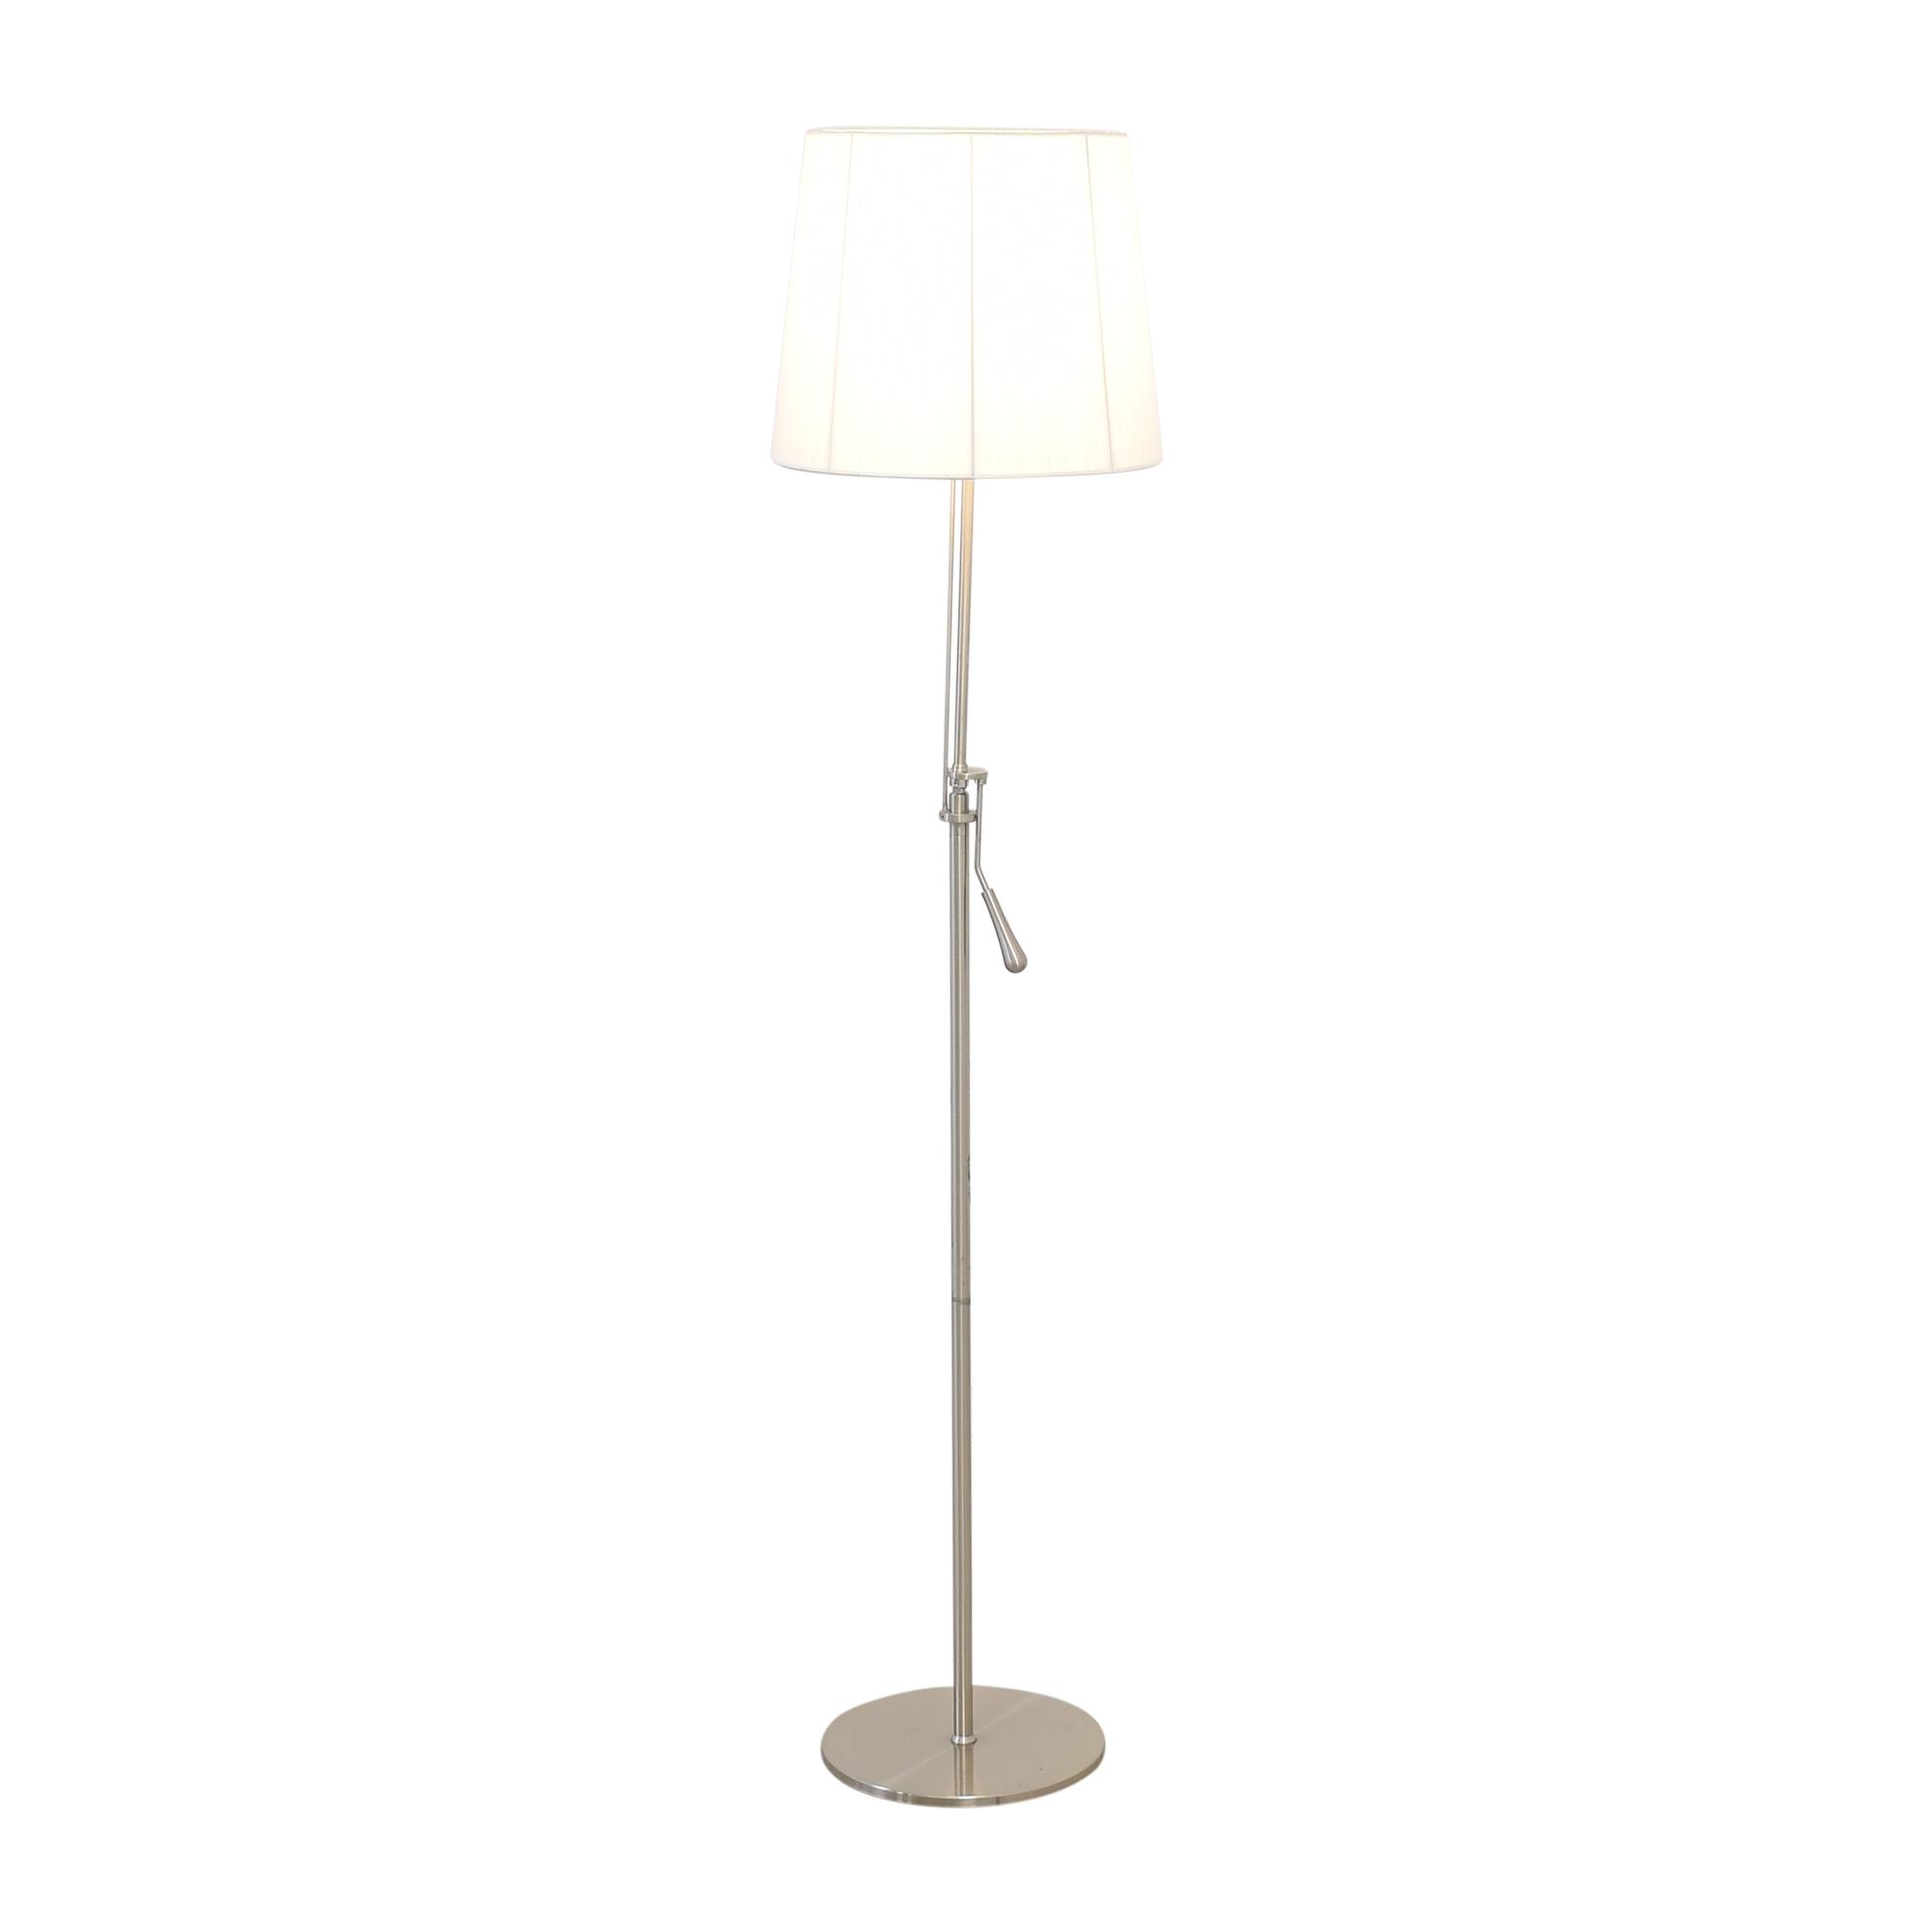 buy Gracious Home Swing Arm Floor Lamp Gracious Home